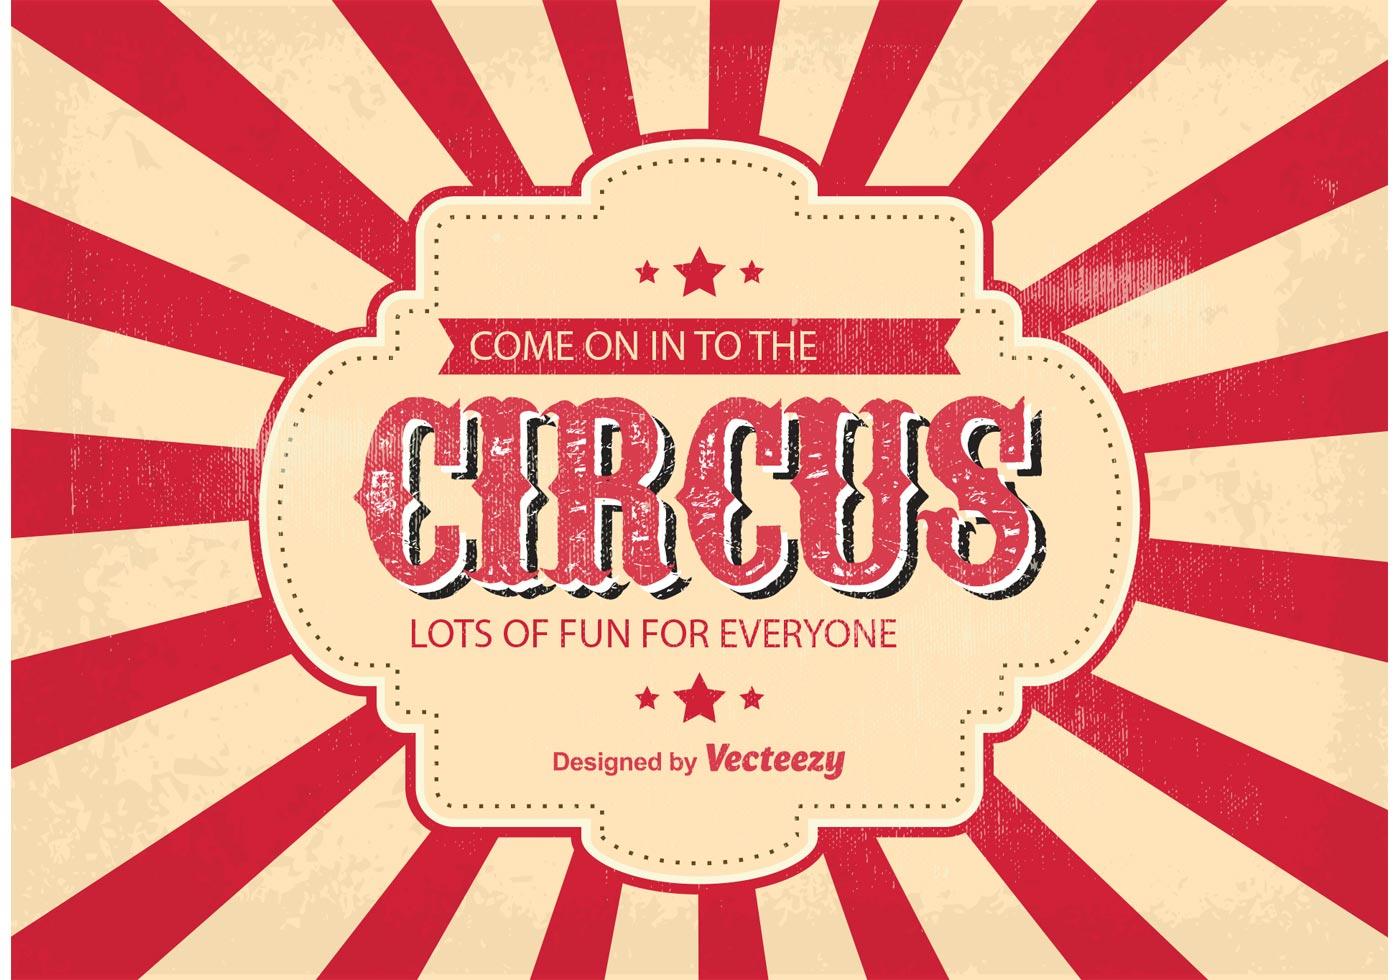 Vintage Circus Vector Ticket Background - Download Free Vector Art ...